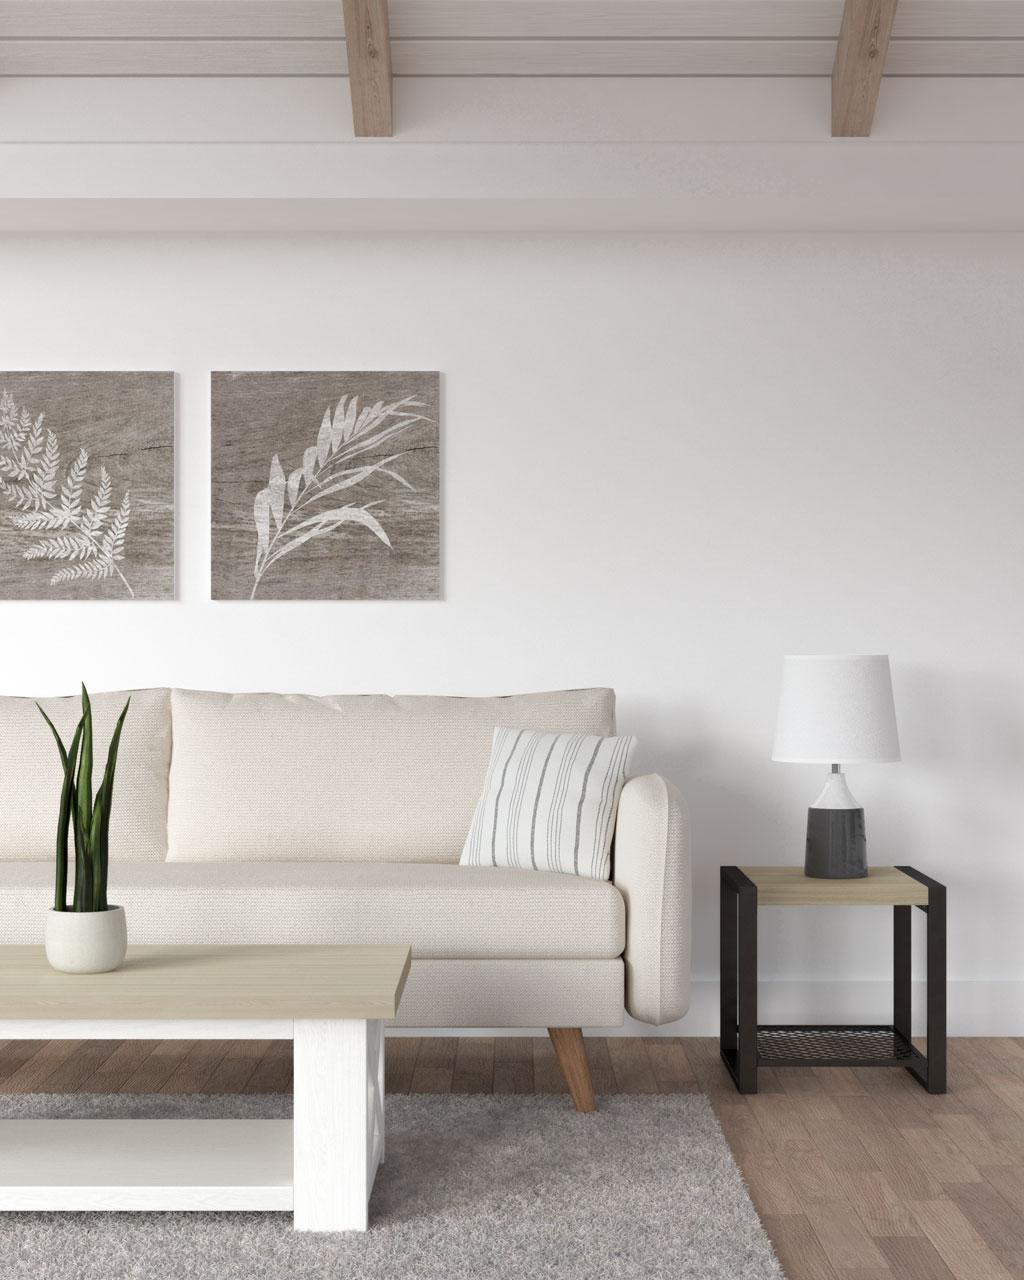 White and gray stripe farmhouse decorative pillow